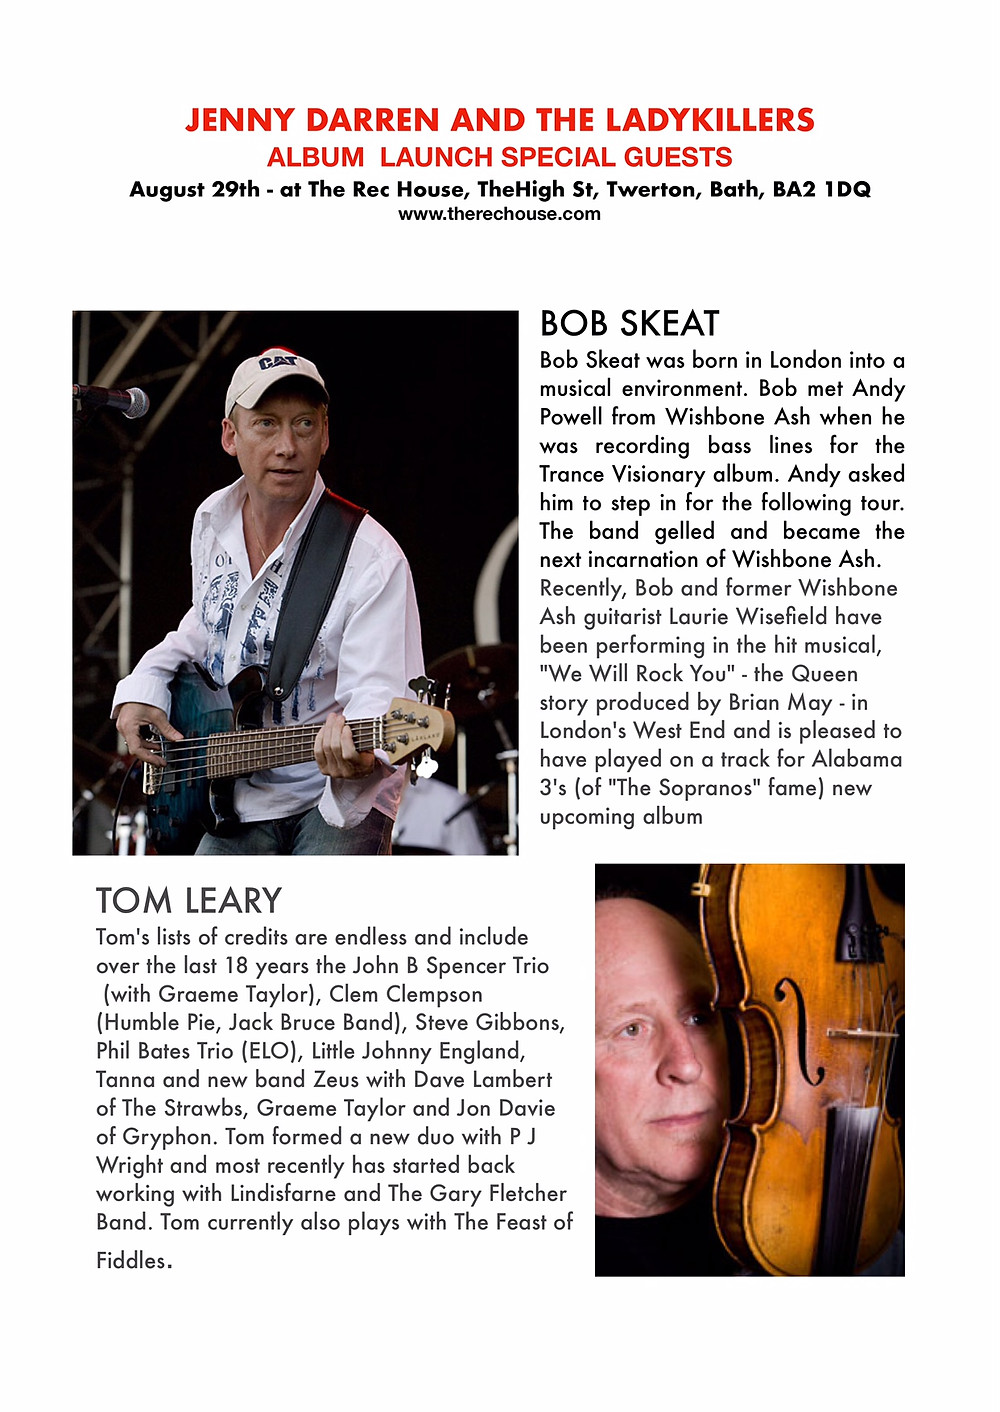 Bob Skeat & Tom Leary